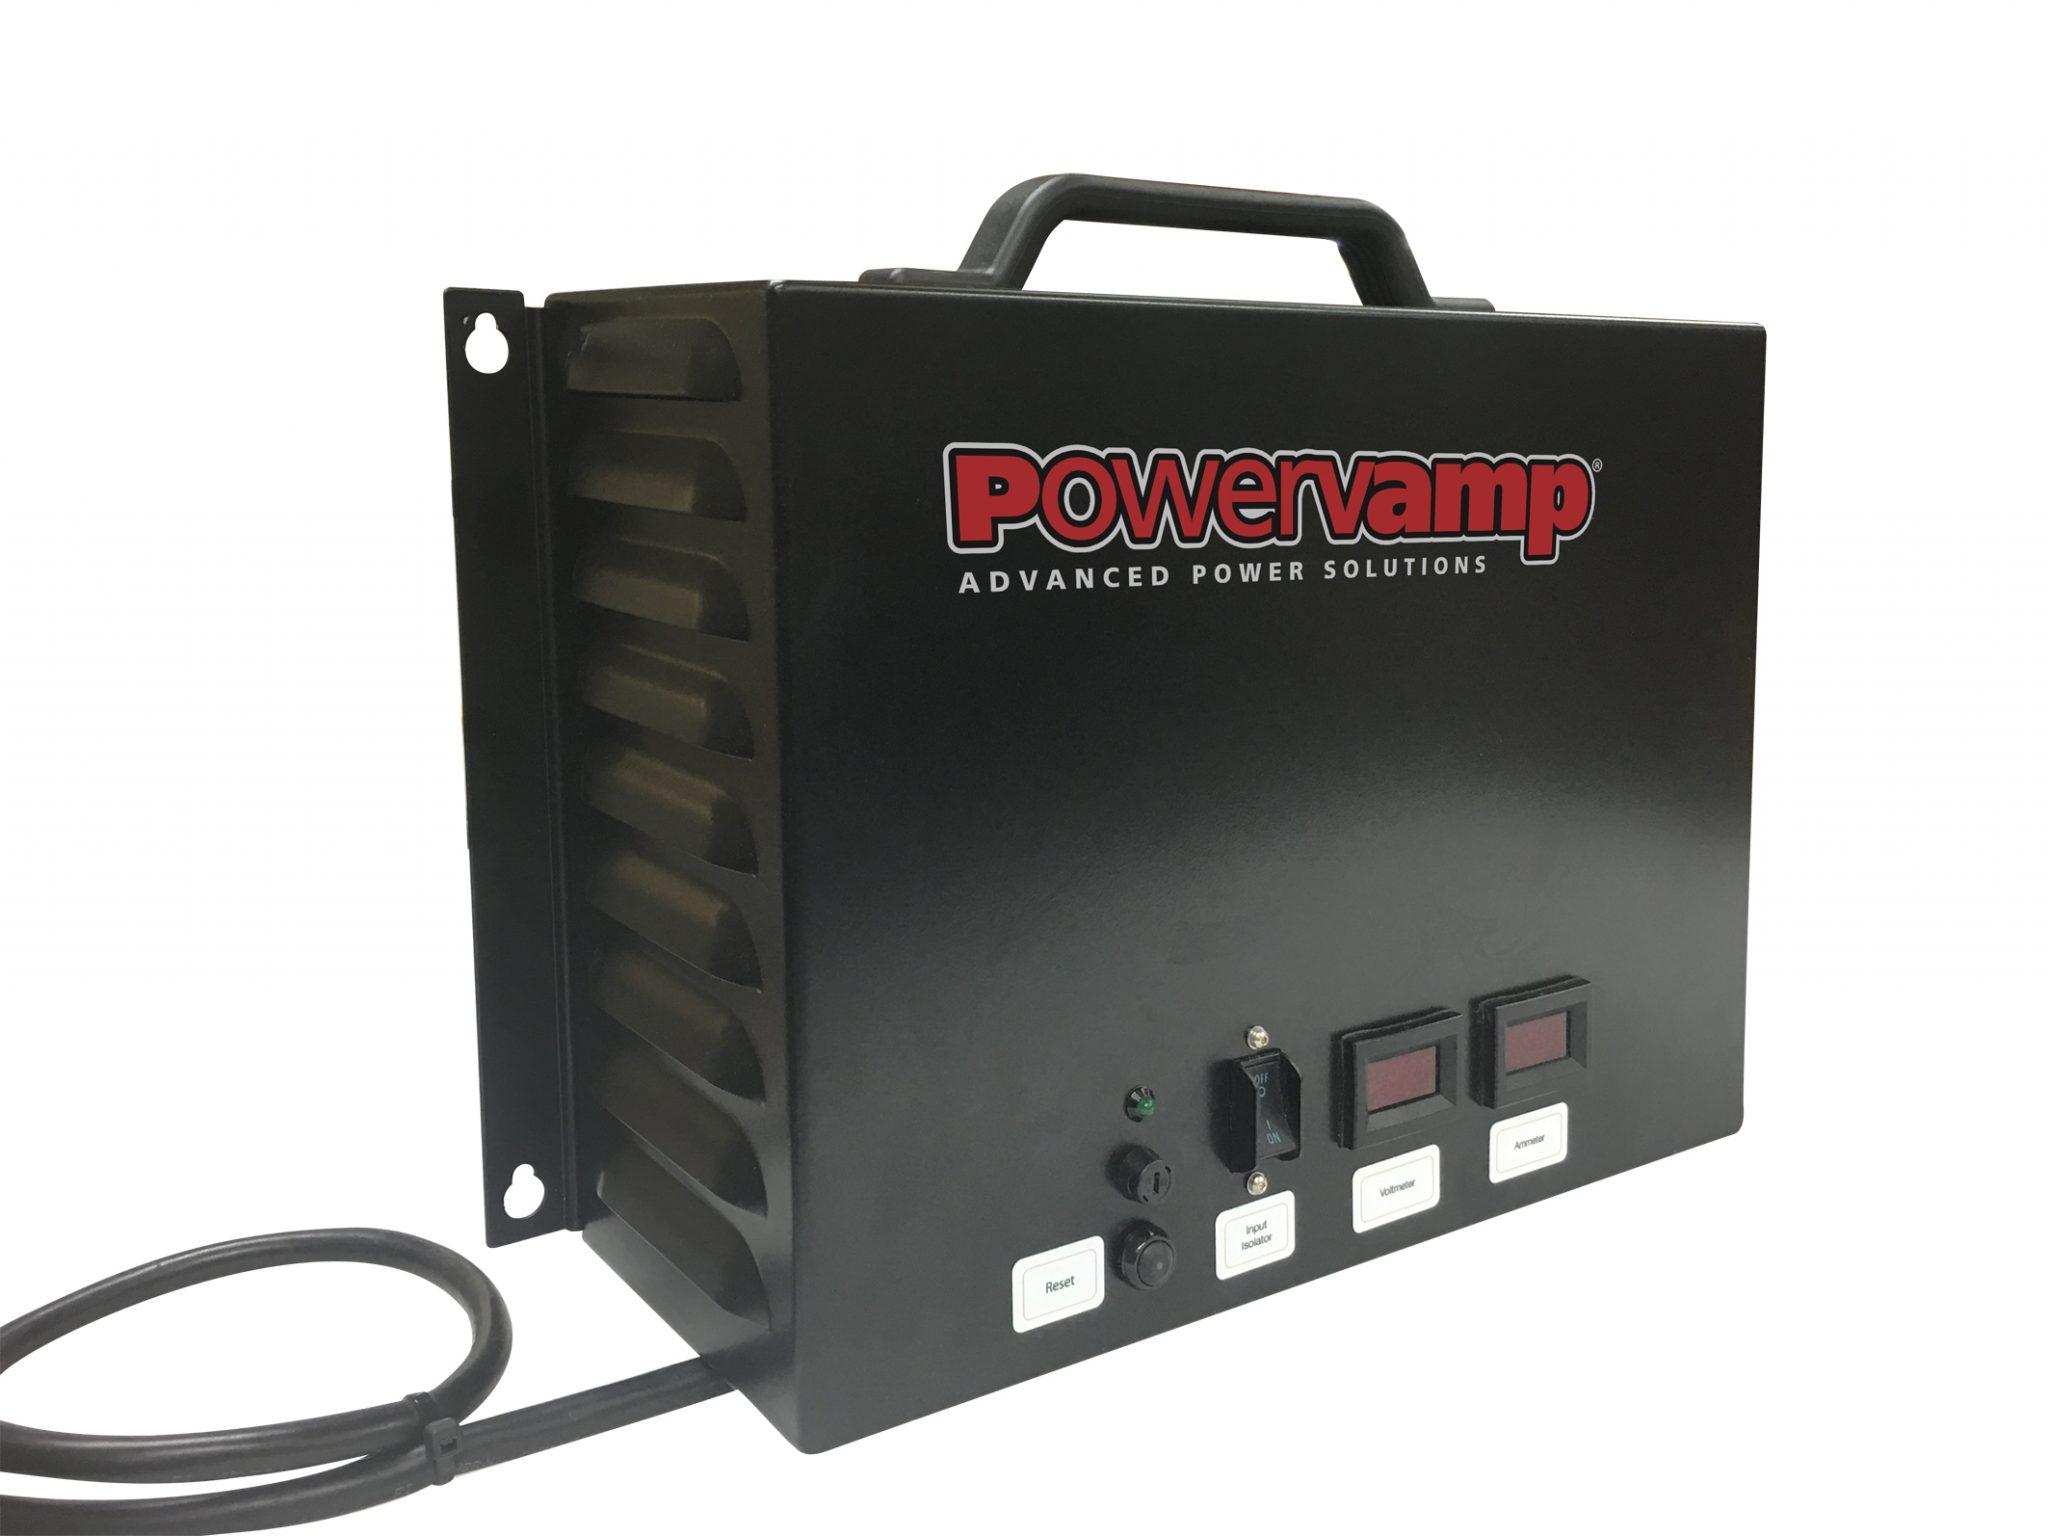 PS12-200 <br/> <small>Lightweight 10V-14V DC Power Supply</small>